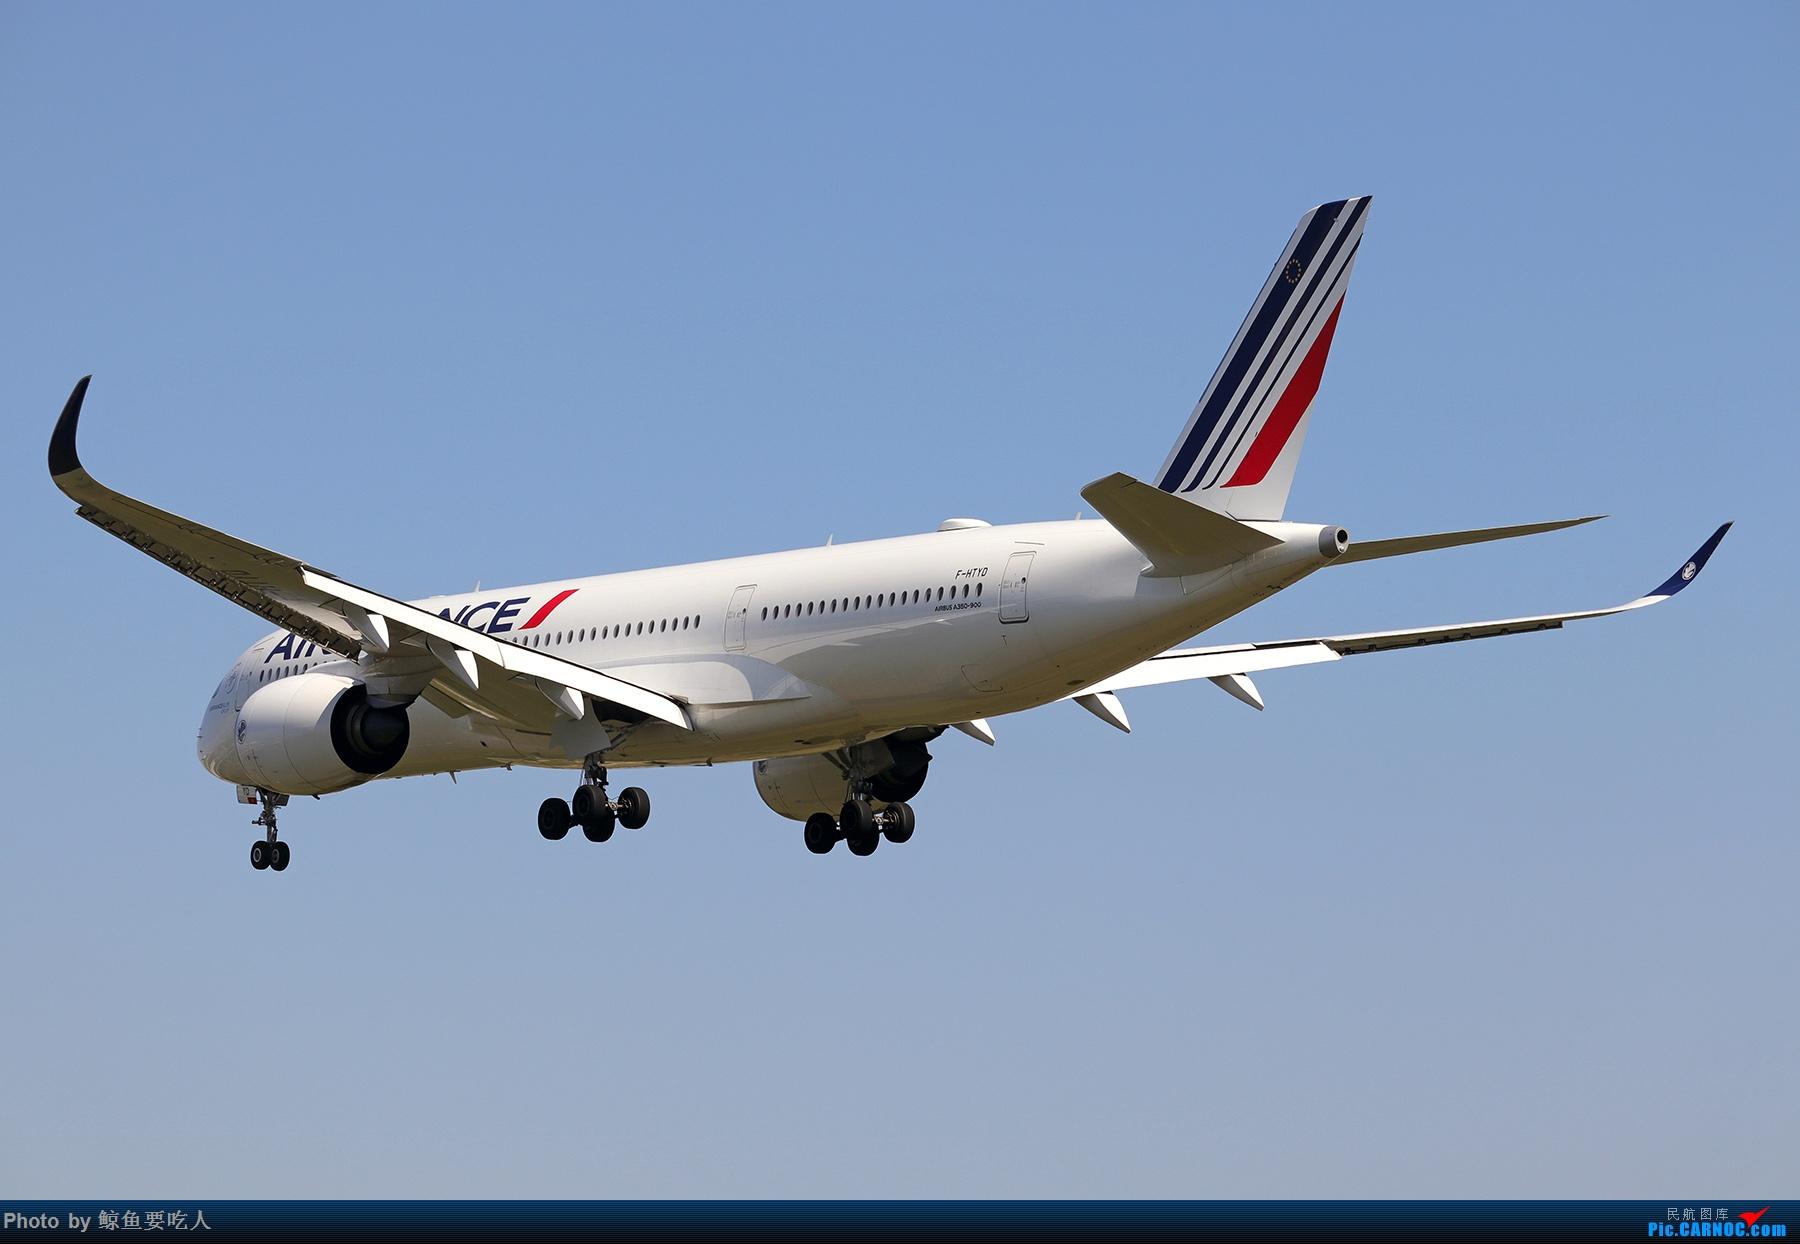 Re:[原创]【多图党】见证疫情后逐步的恢复,加拿大夏日多伦多皮尔逊机场拍机~ 乐见诸航空公司复航多伦多 AIRBUS A350-900 F-HTYD 多伦多皮尔逊国际机场